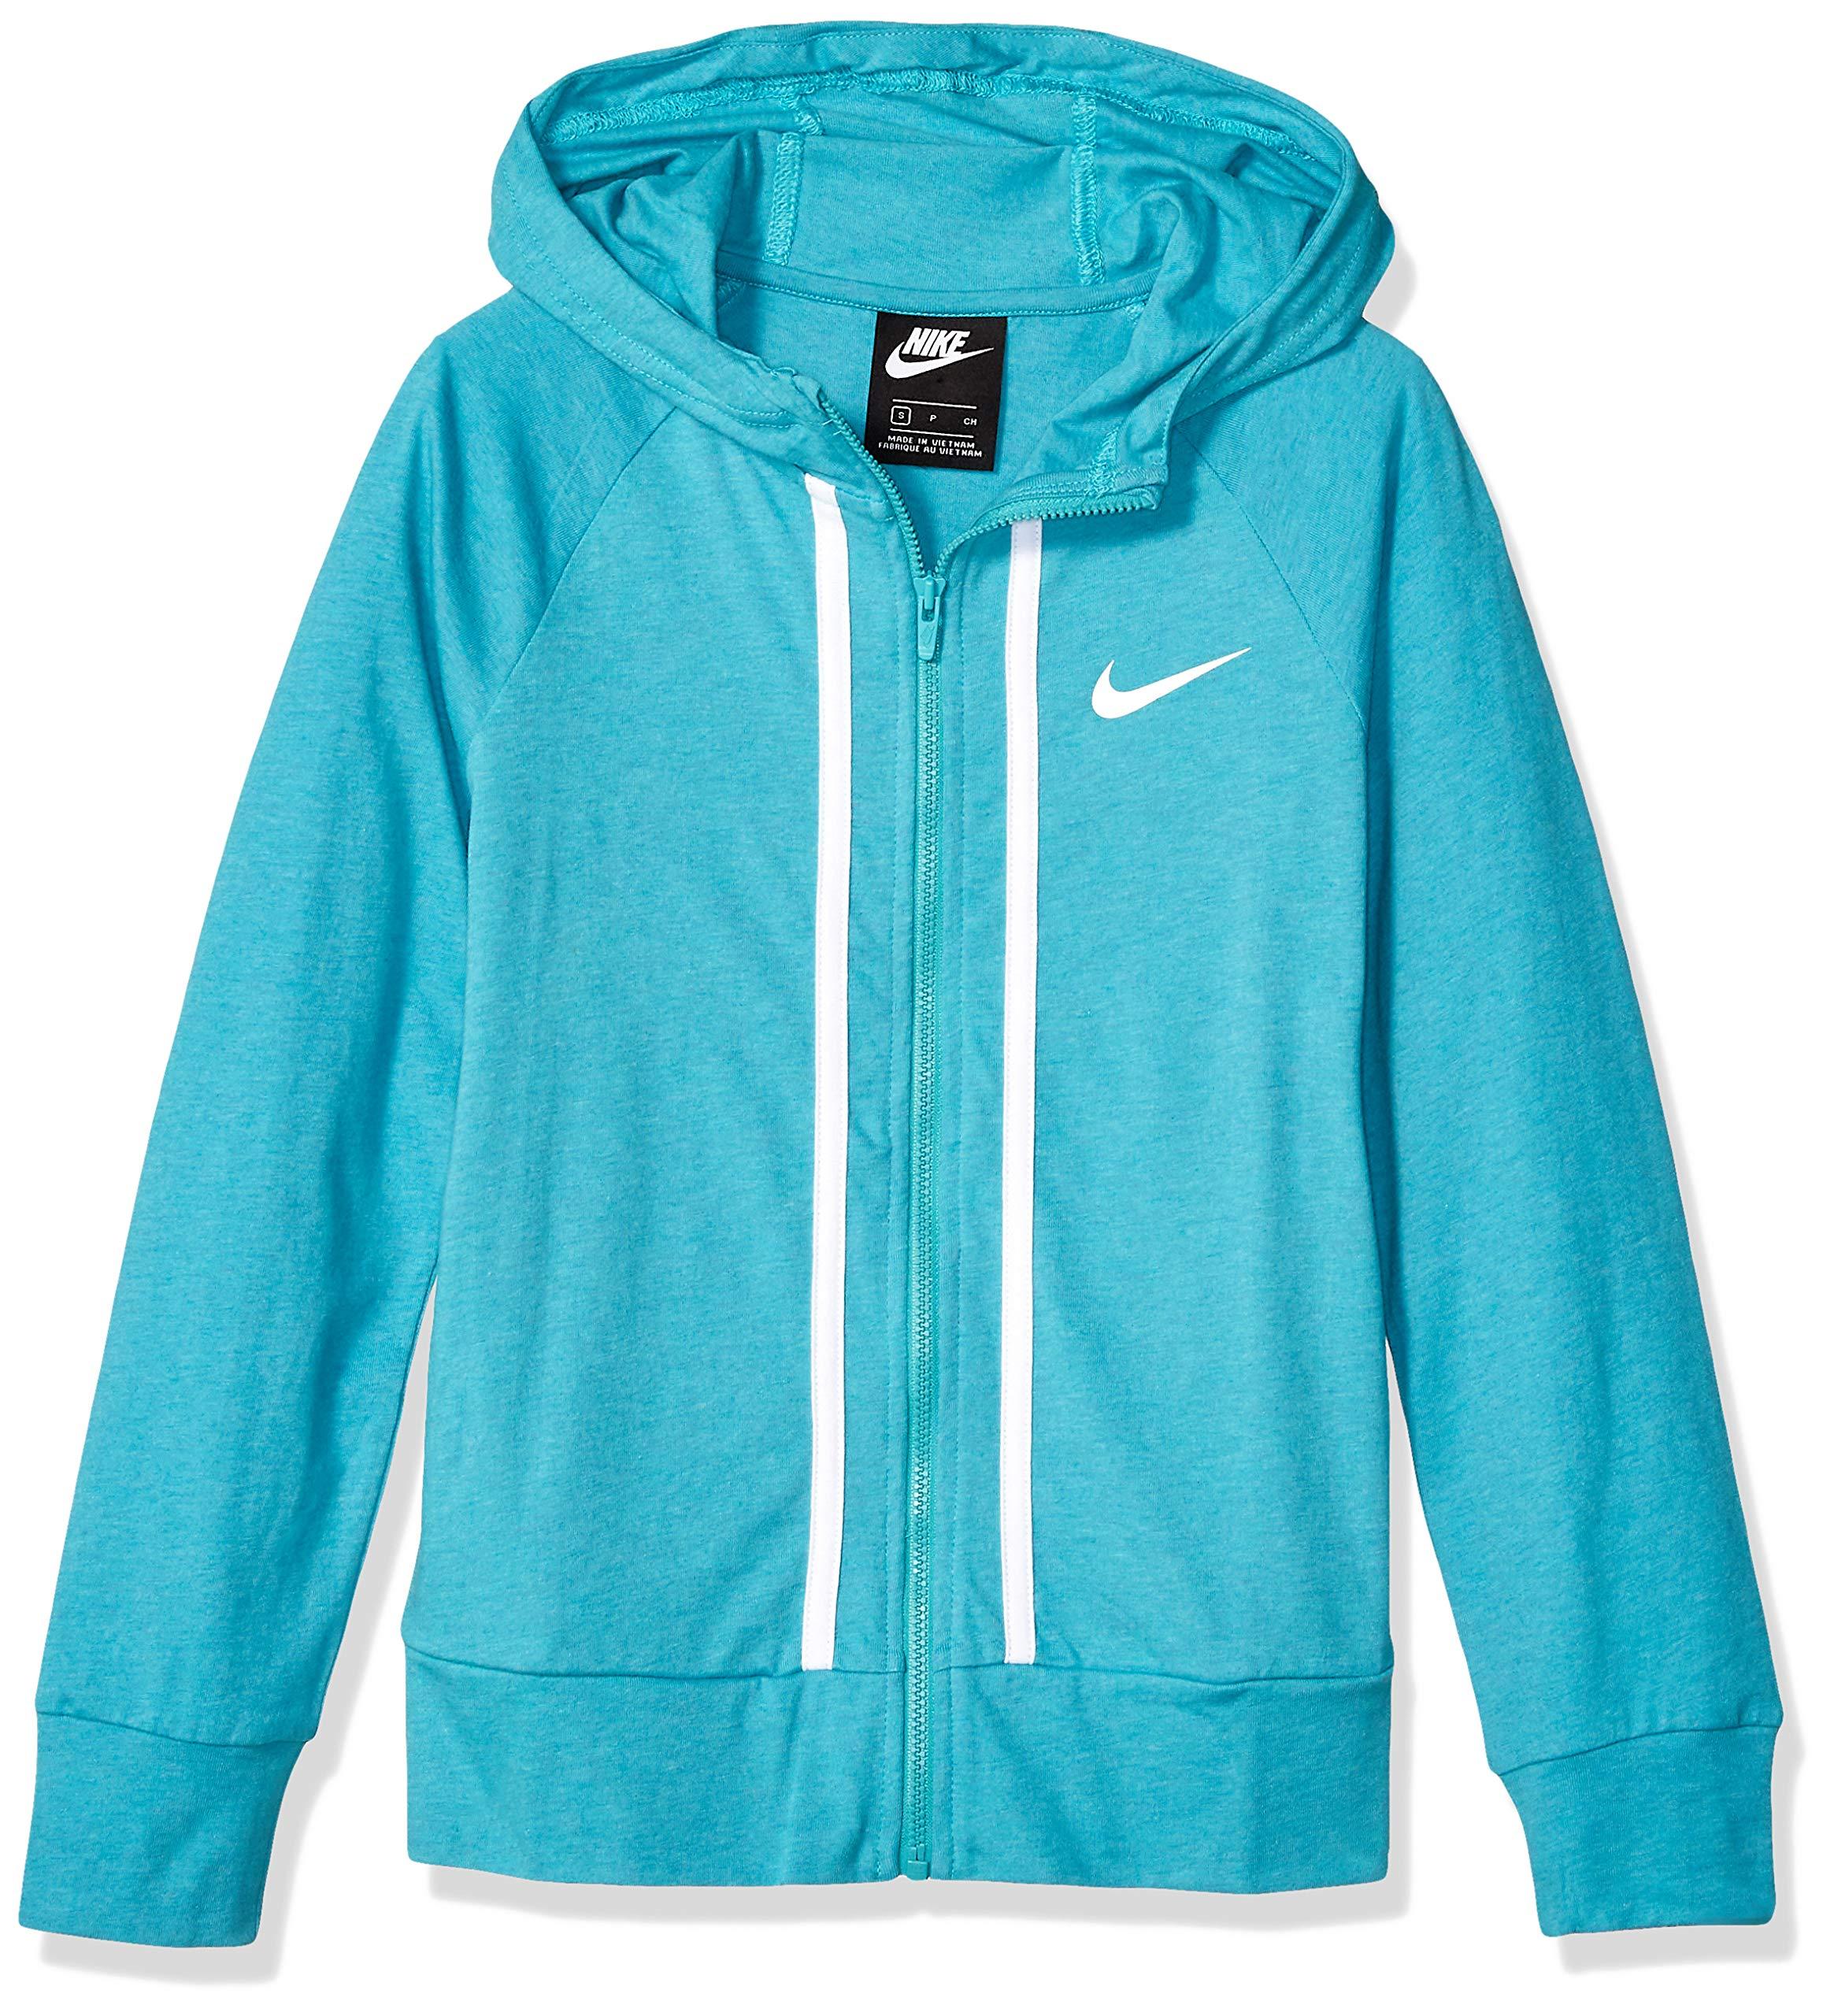 NIKE Girl's NSW Full-Zip Jersey, Cabana/Heather/White, Large by Nike